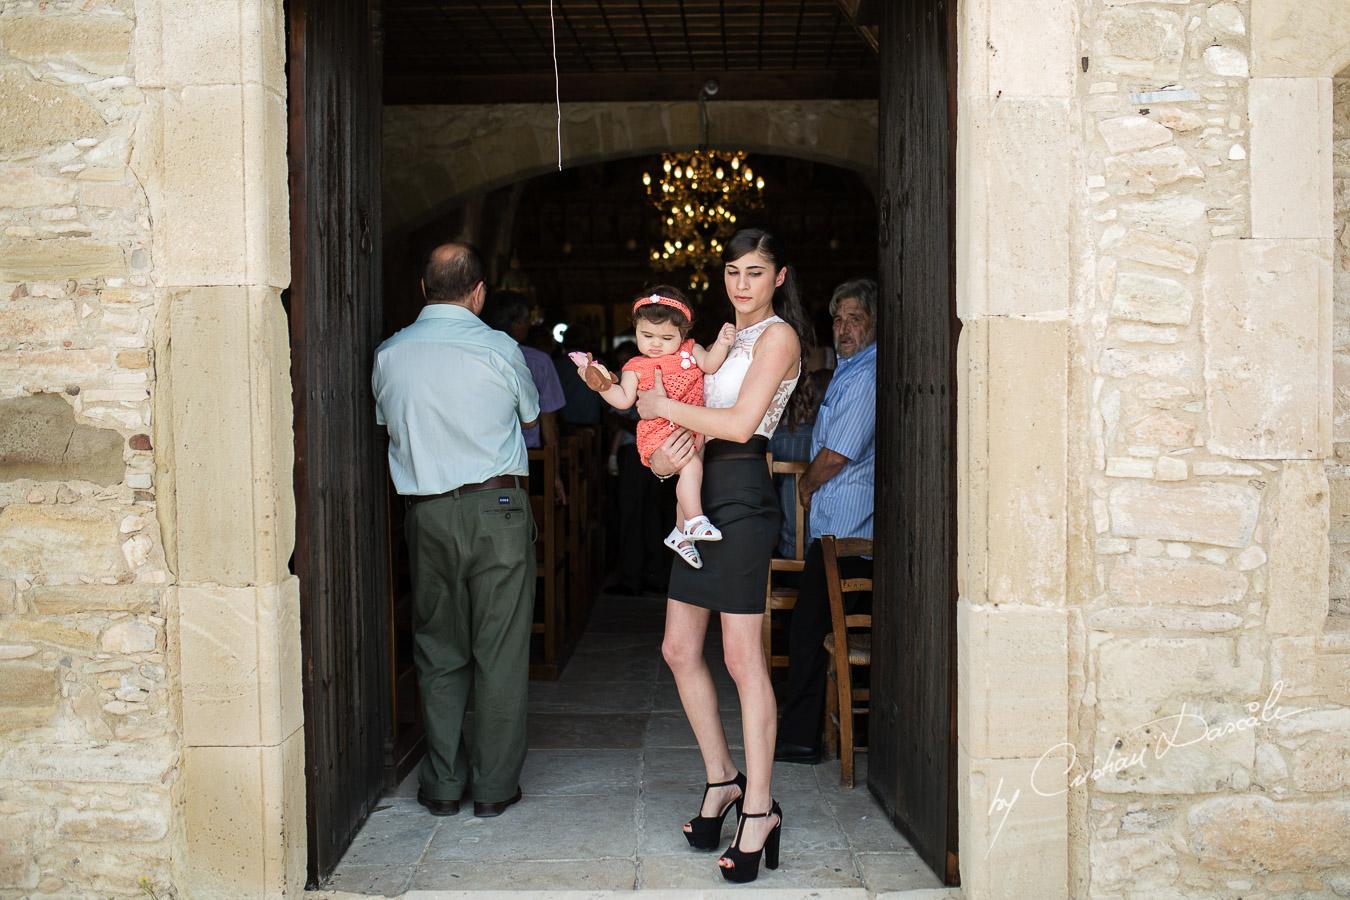 Joyous Christening in Limassol - 18